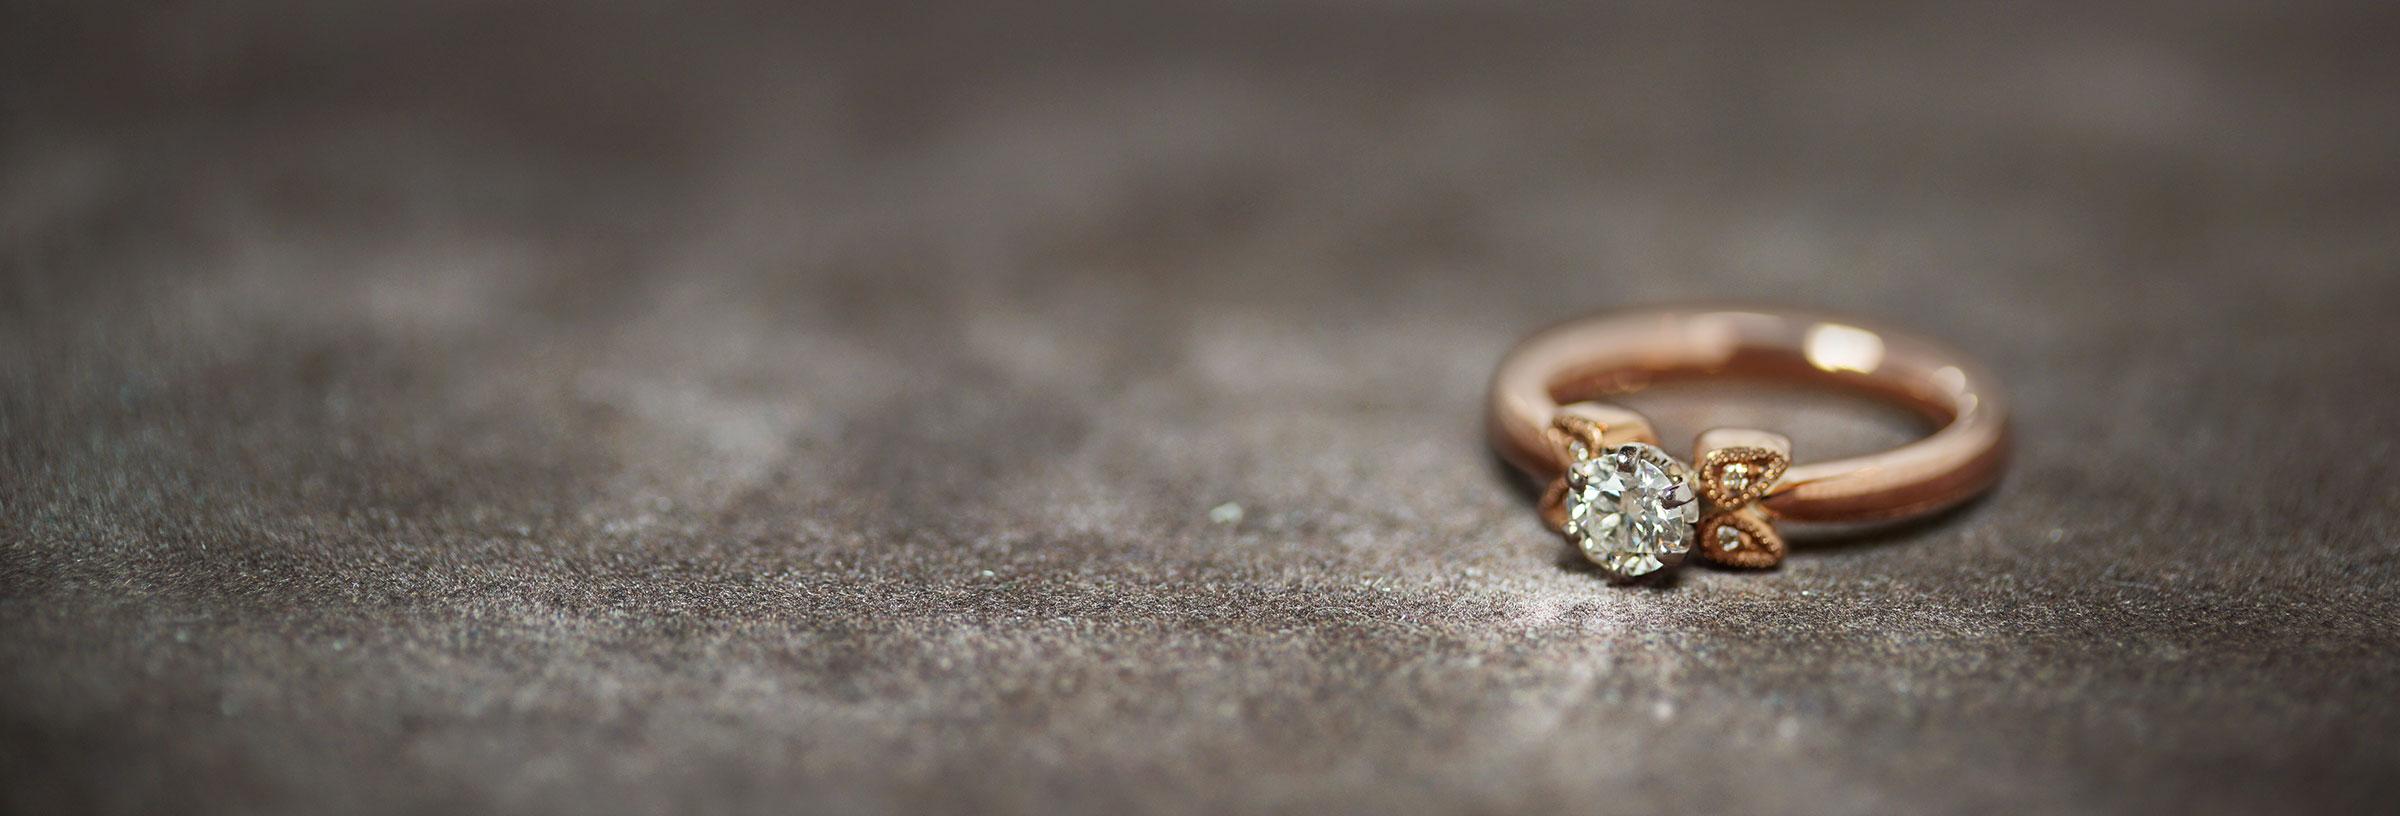 diamond-rose-gold-and-palladium-vintage-leaf-motif-inspired-engagement-ring